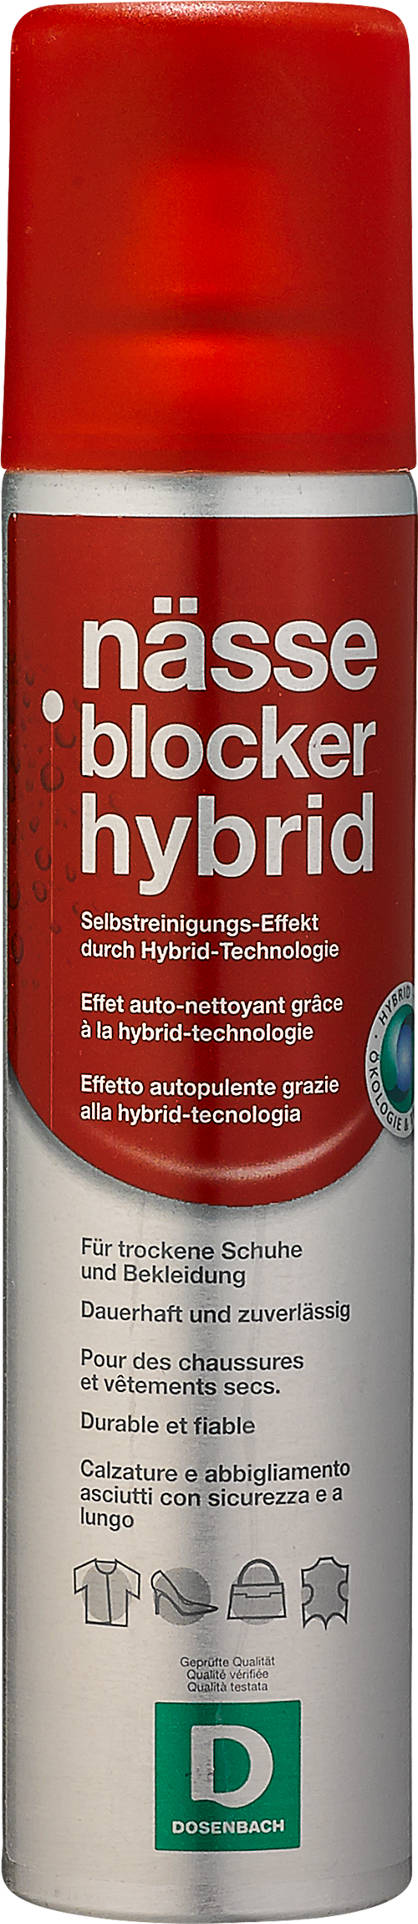 Dosenbach Dosenbach Trattamento impermeabile Hybrid